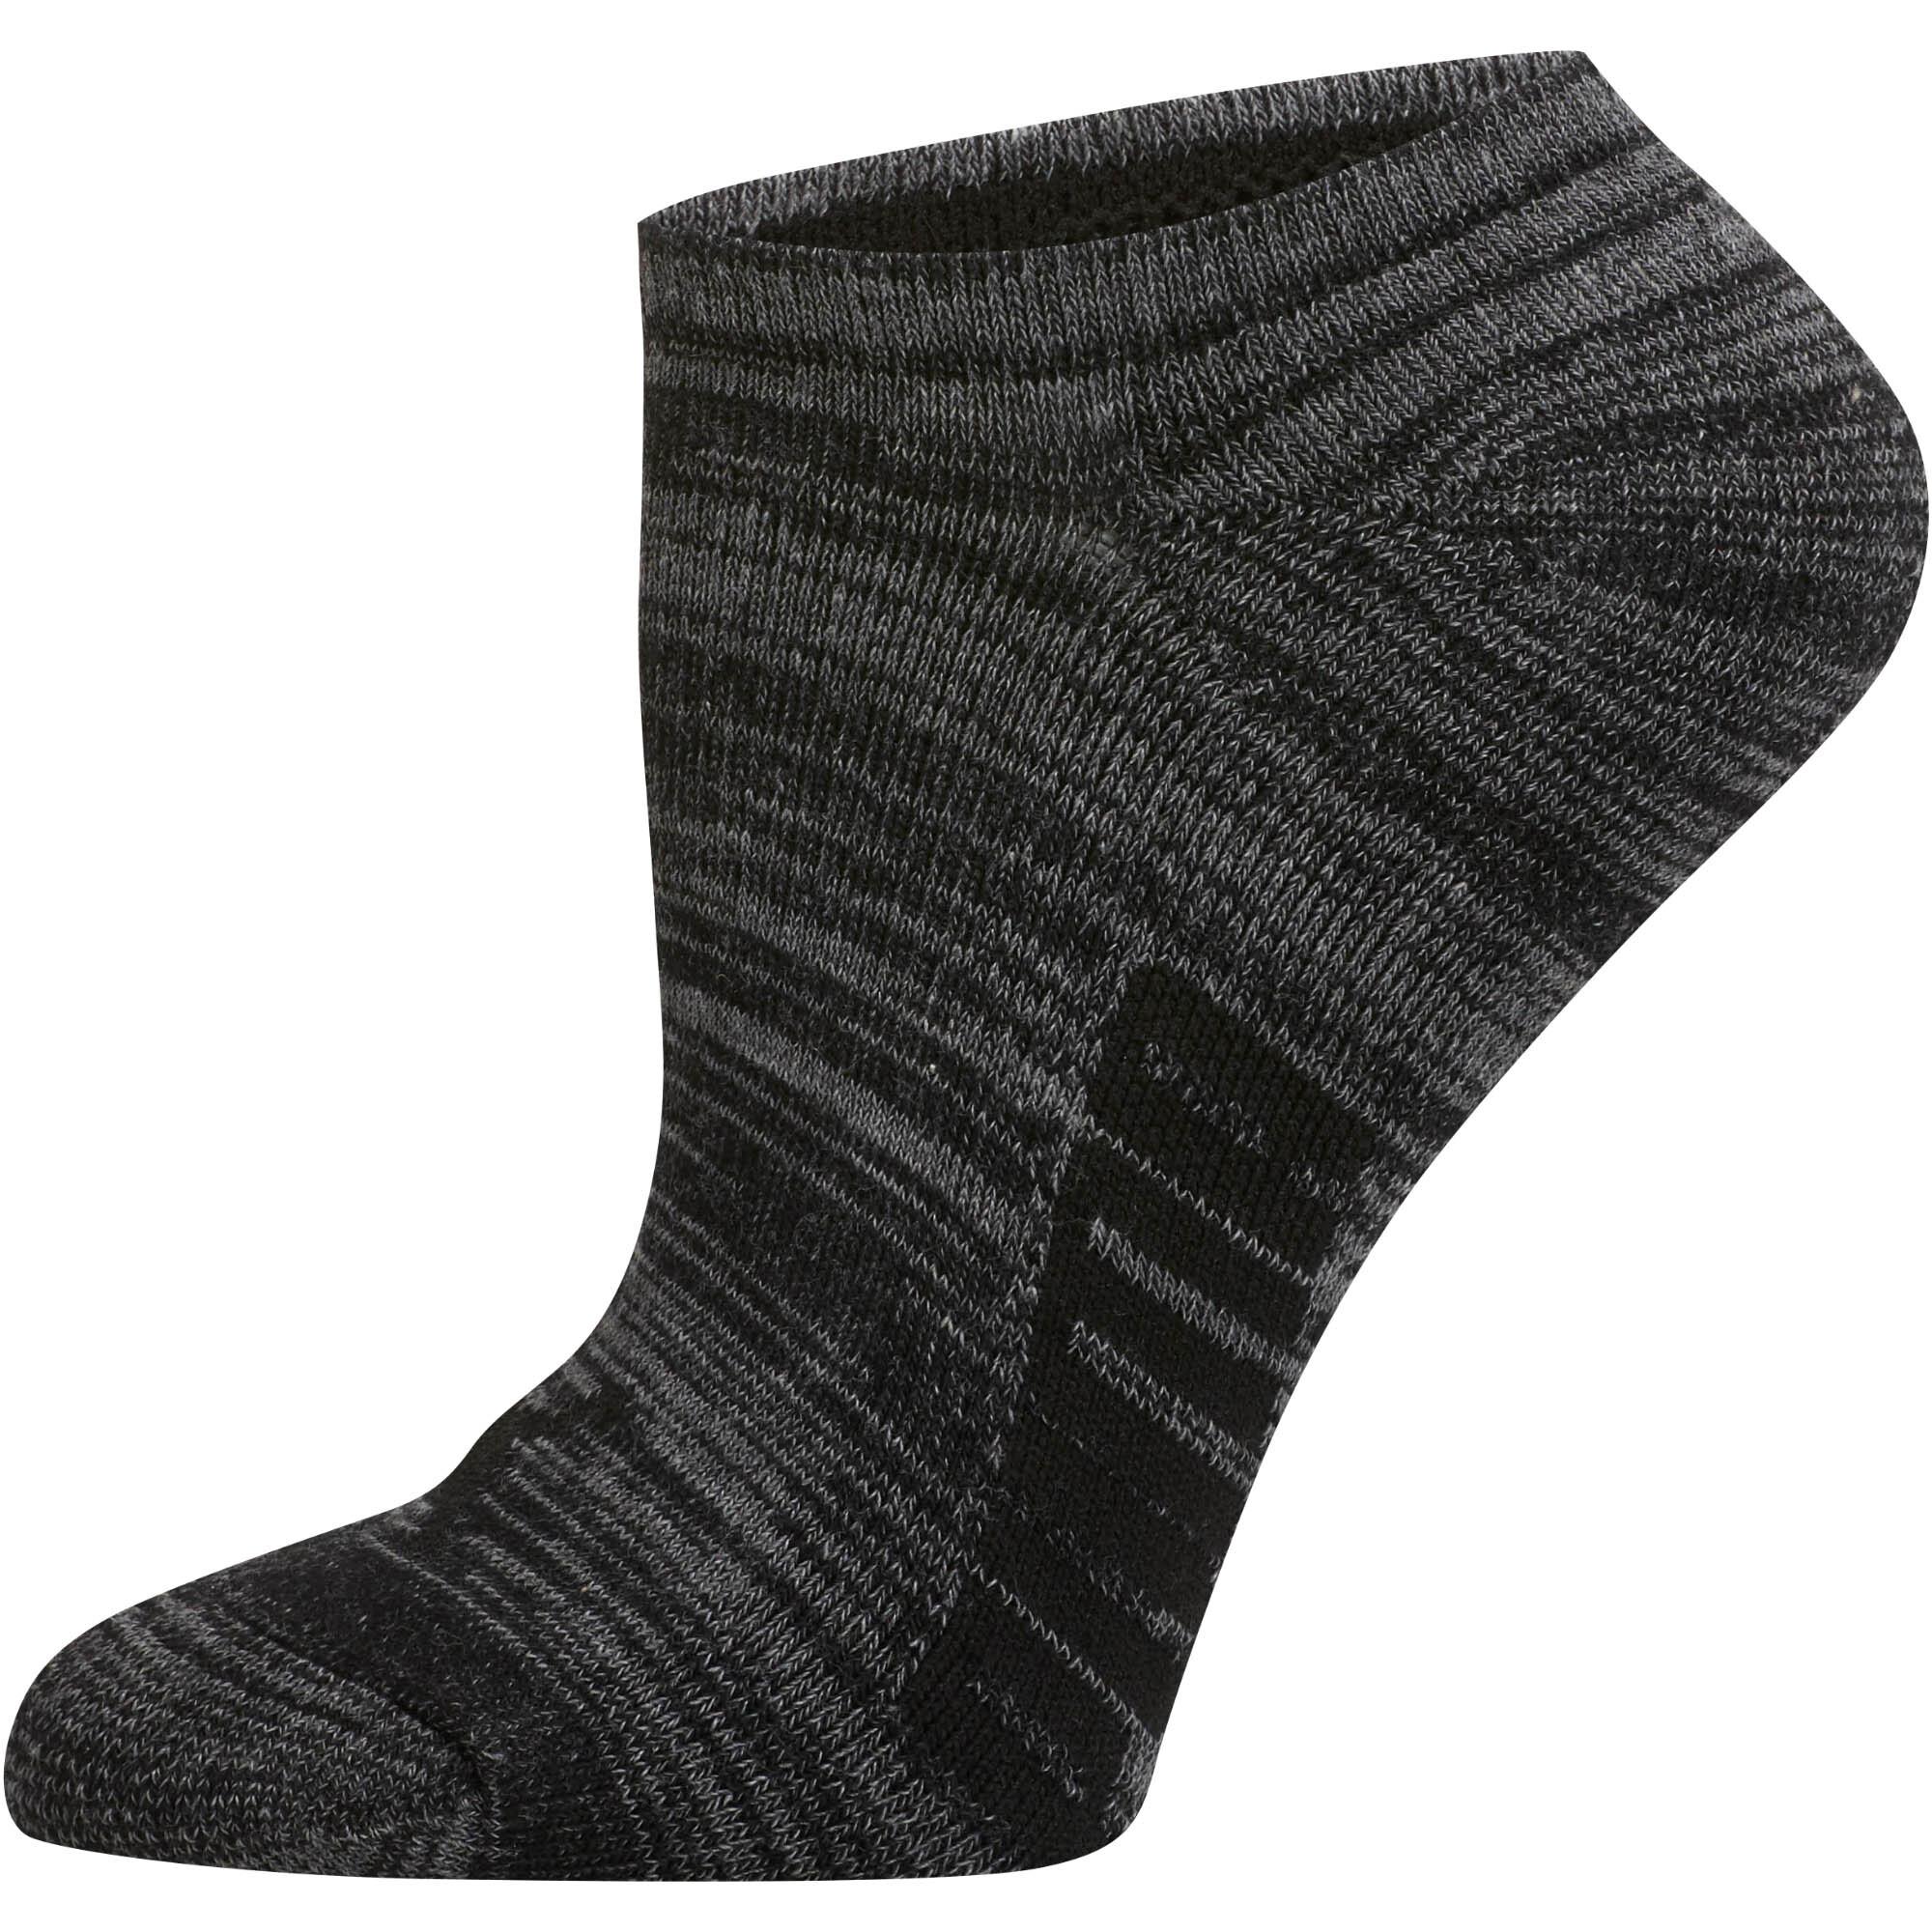 Licence-Women-s-Invisible-No-Show-Socks-3-Pack-Women-Socks-3-Pack thumbnail 8